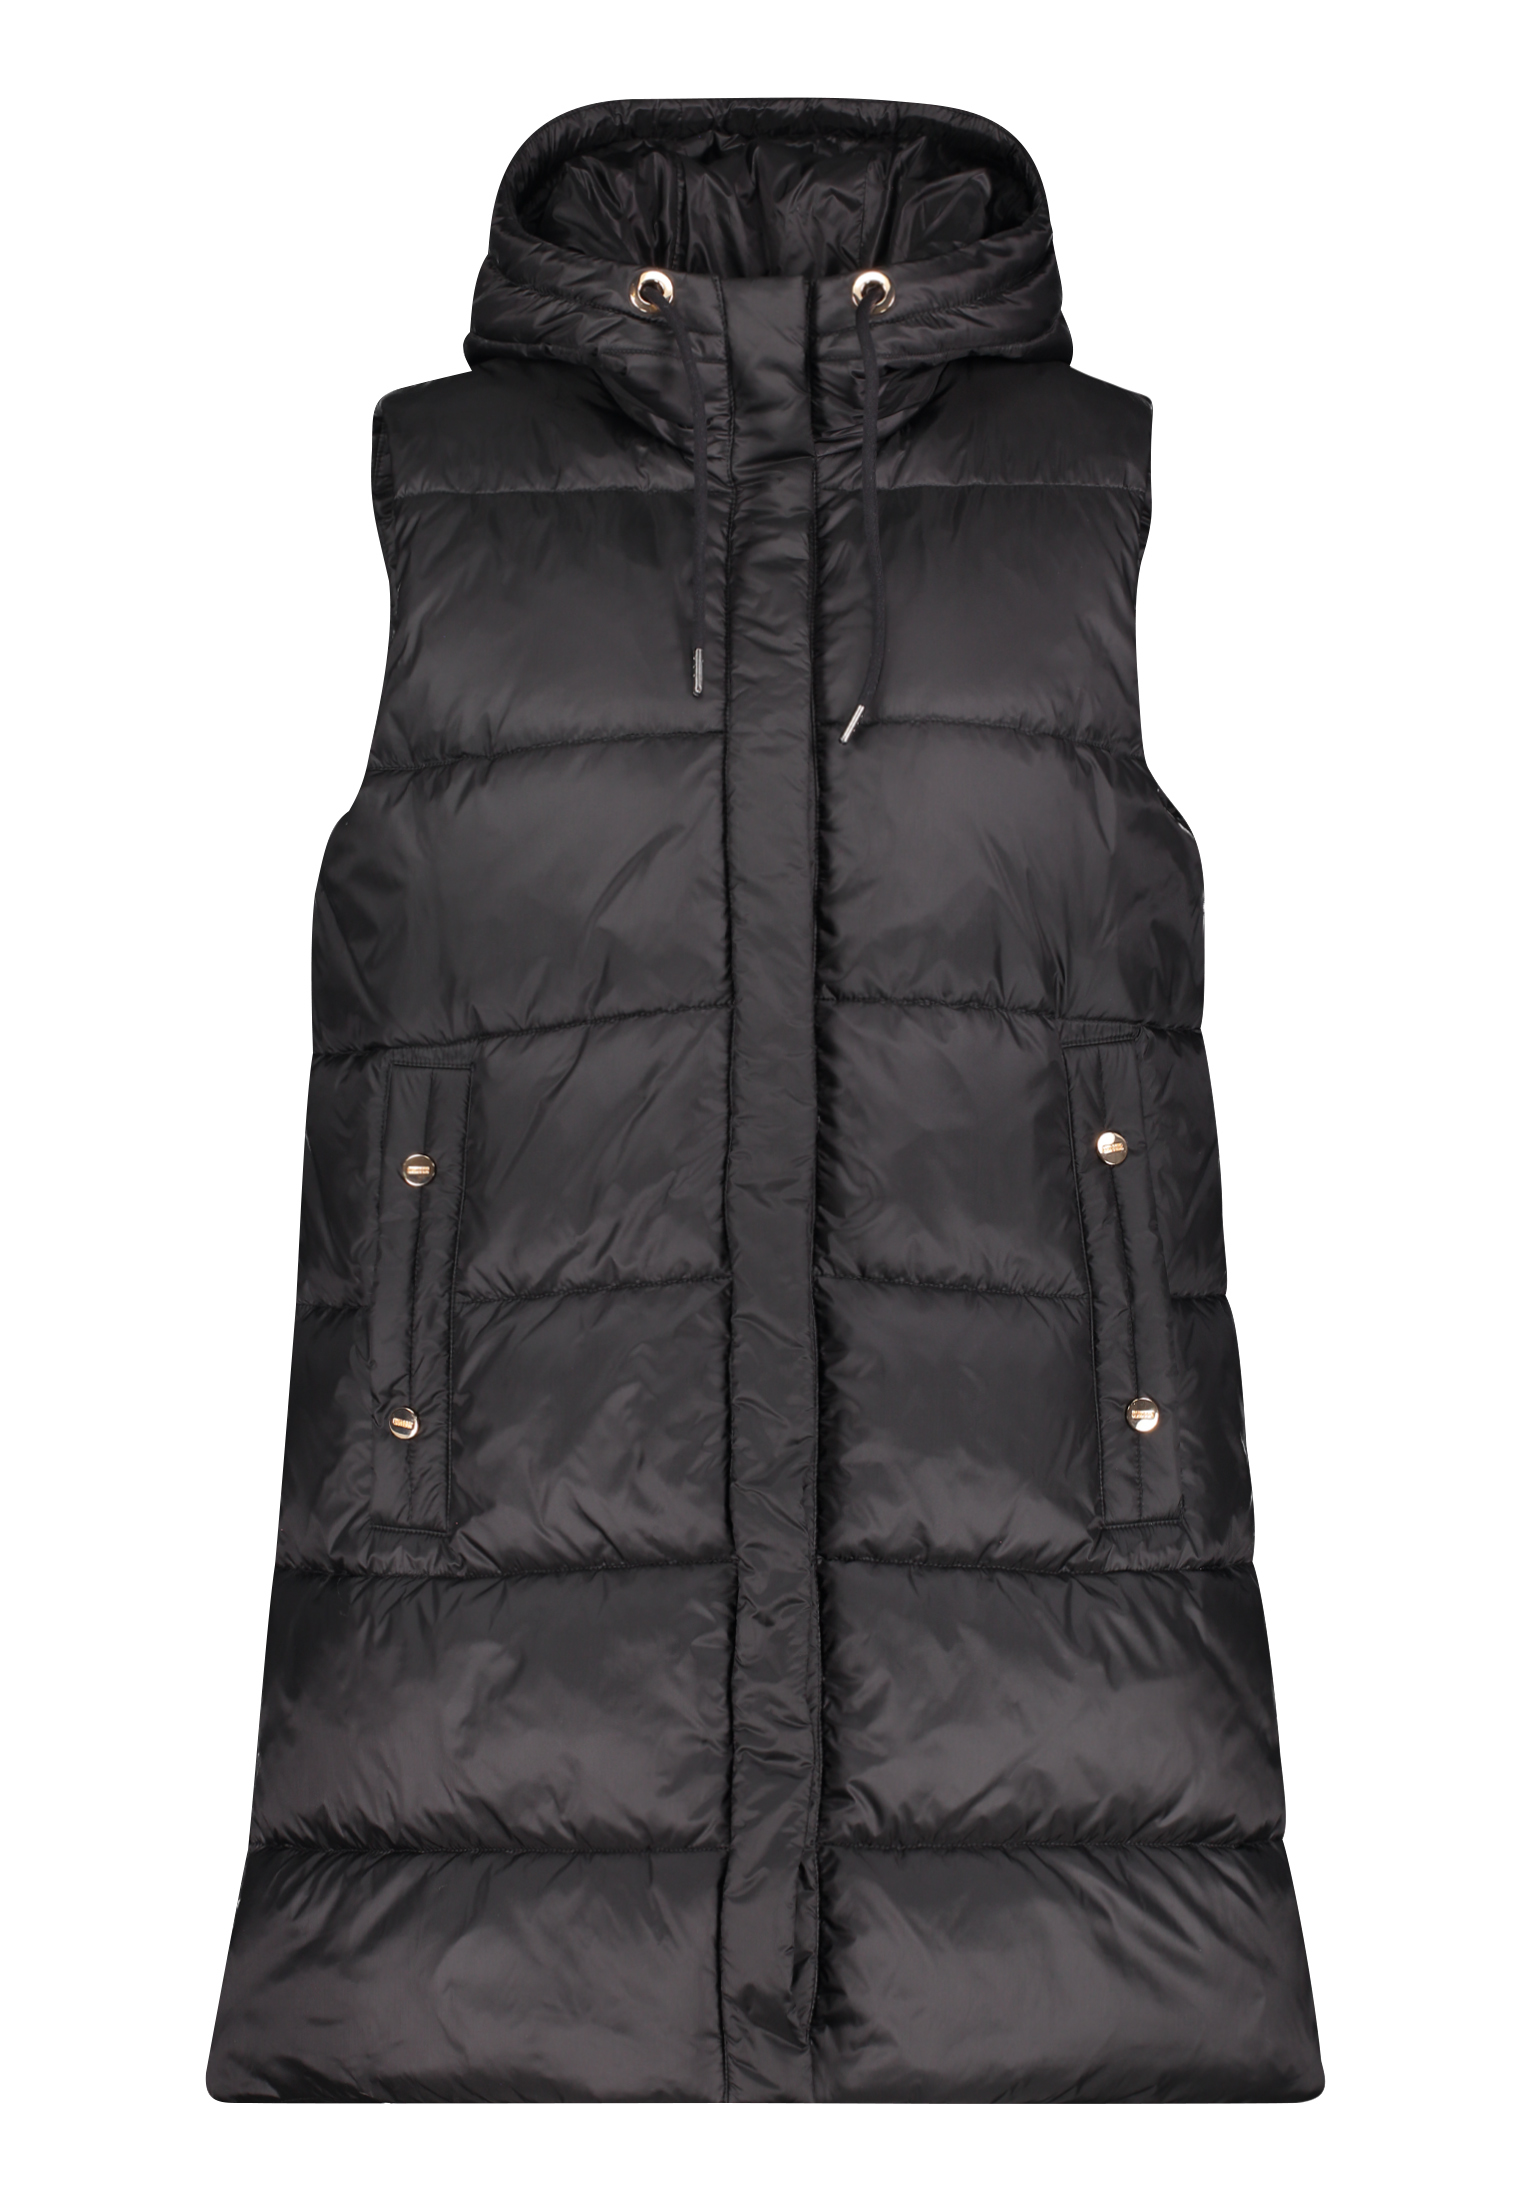 Betty Barclay 72261537 vest